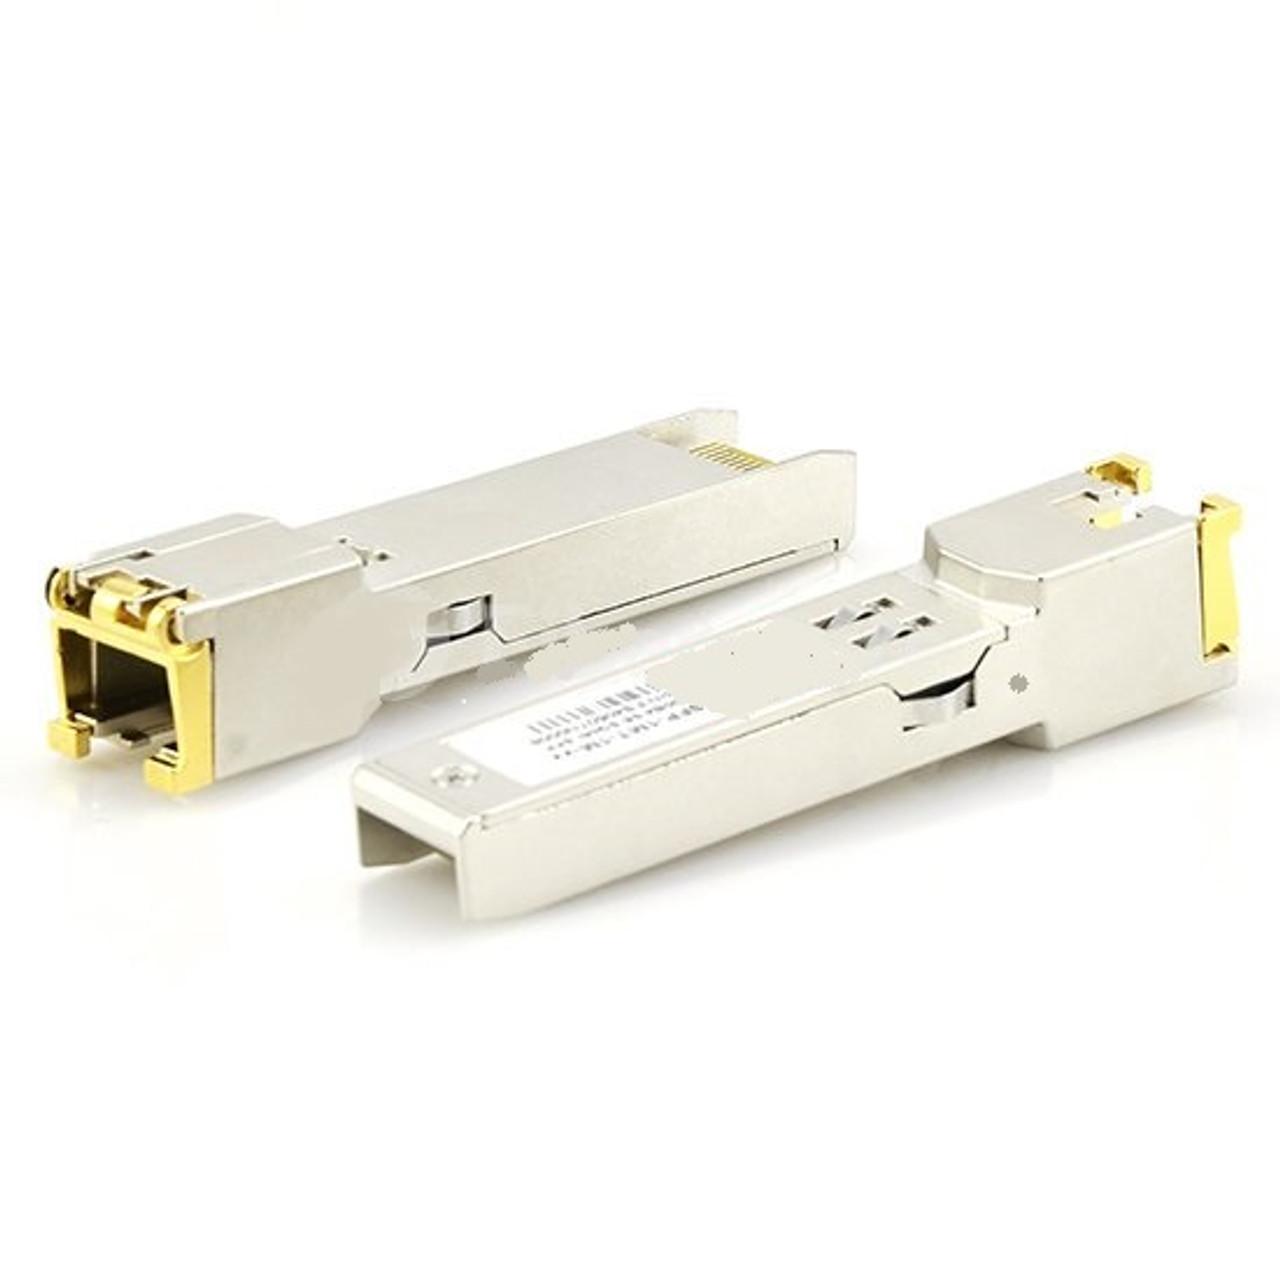 Cisco GLC-FE-T-I Compatible 100BASE-T SFP Copper RJ-45 100m IND Transceiver